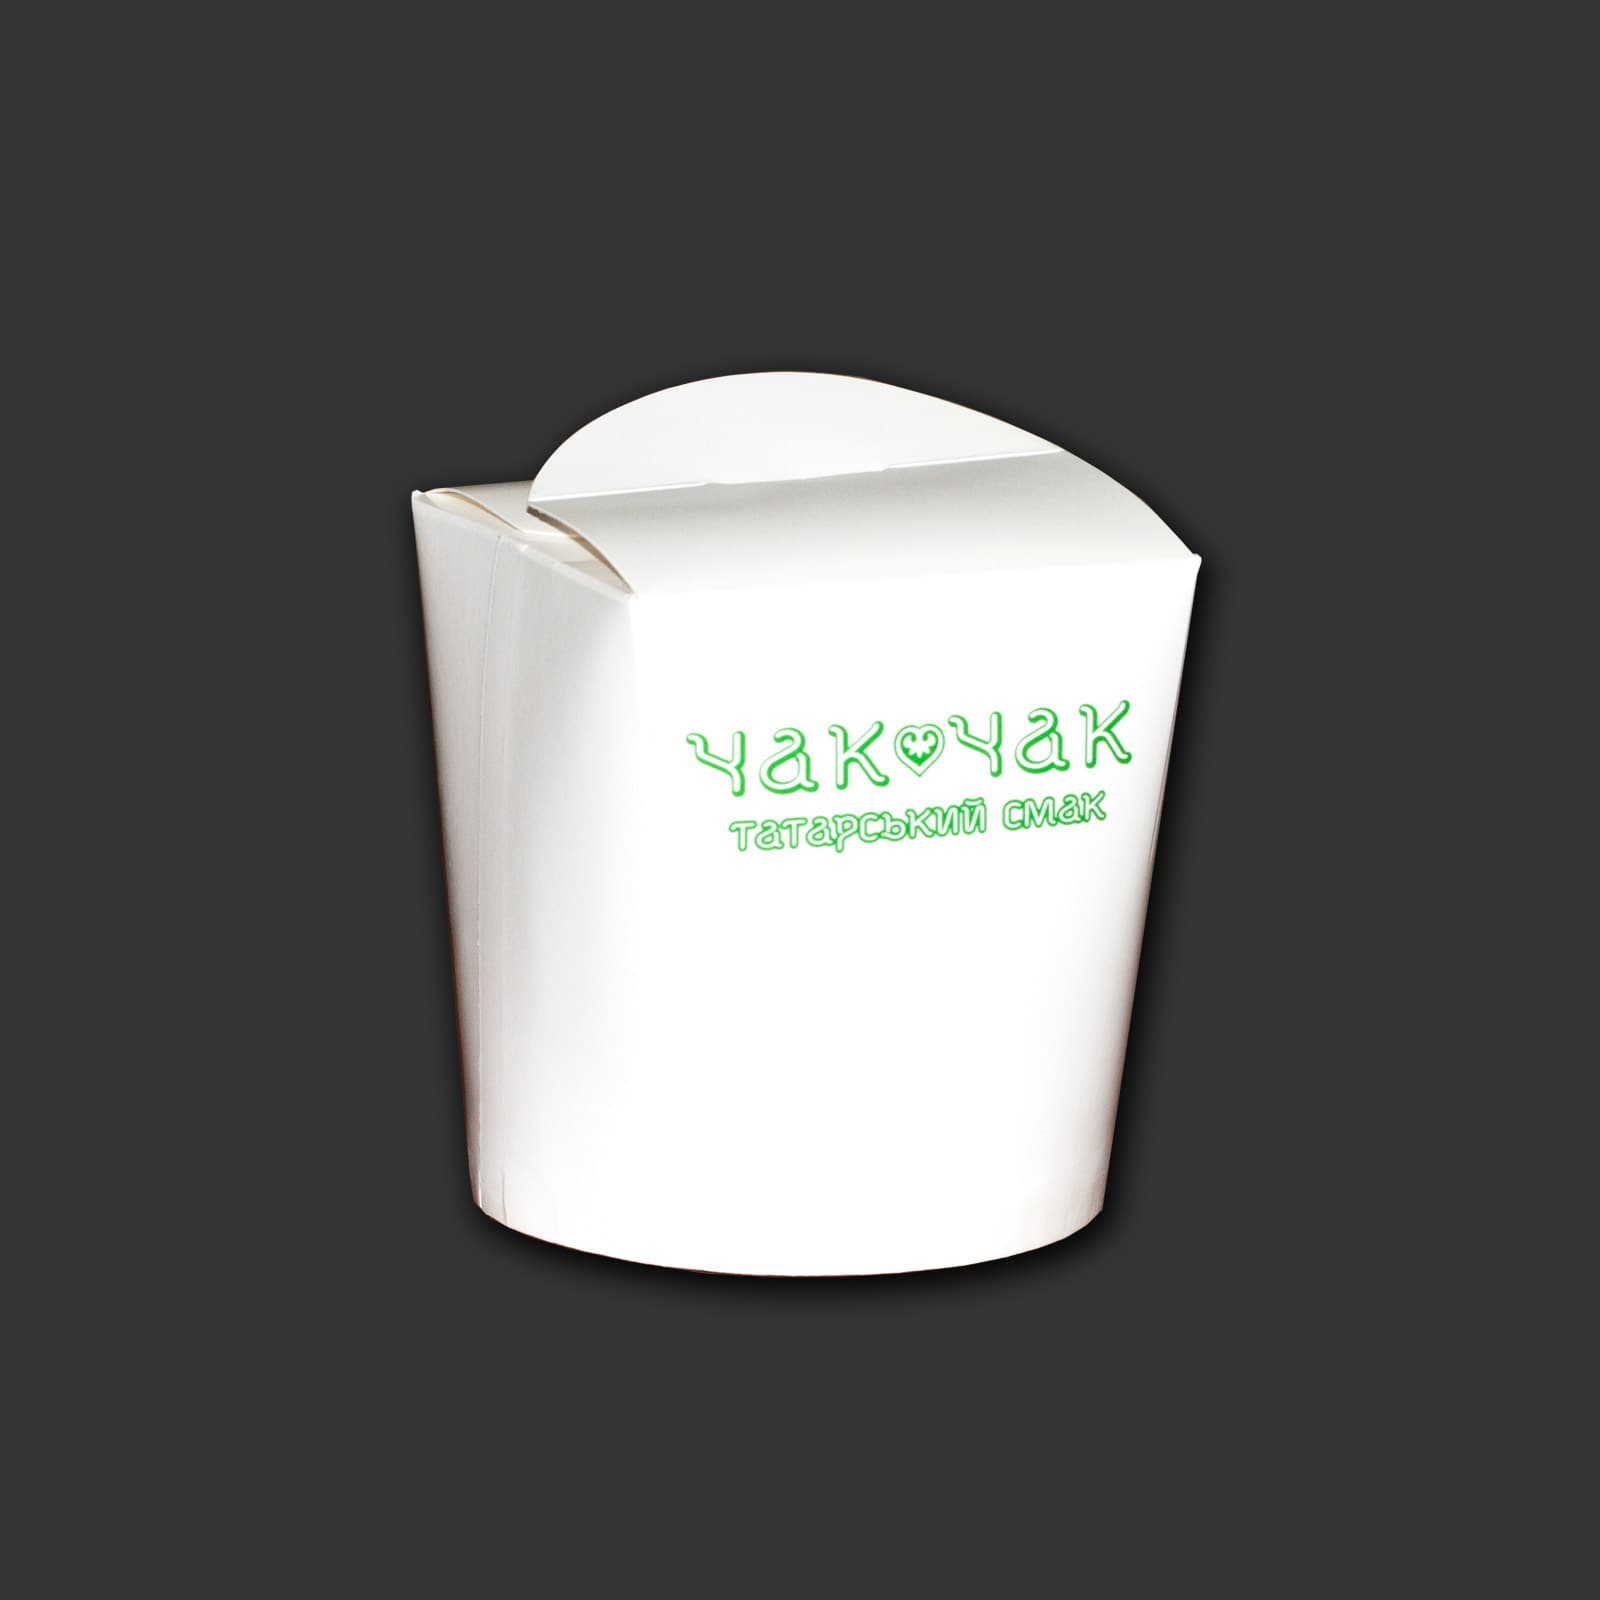 Тростниковый сахар с логотипом в стиках - Шокоru